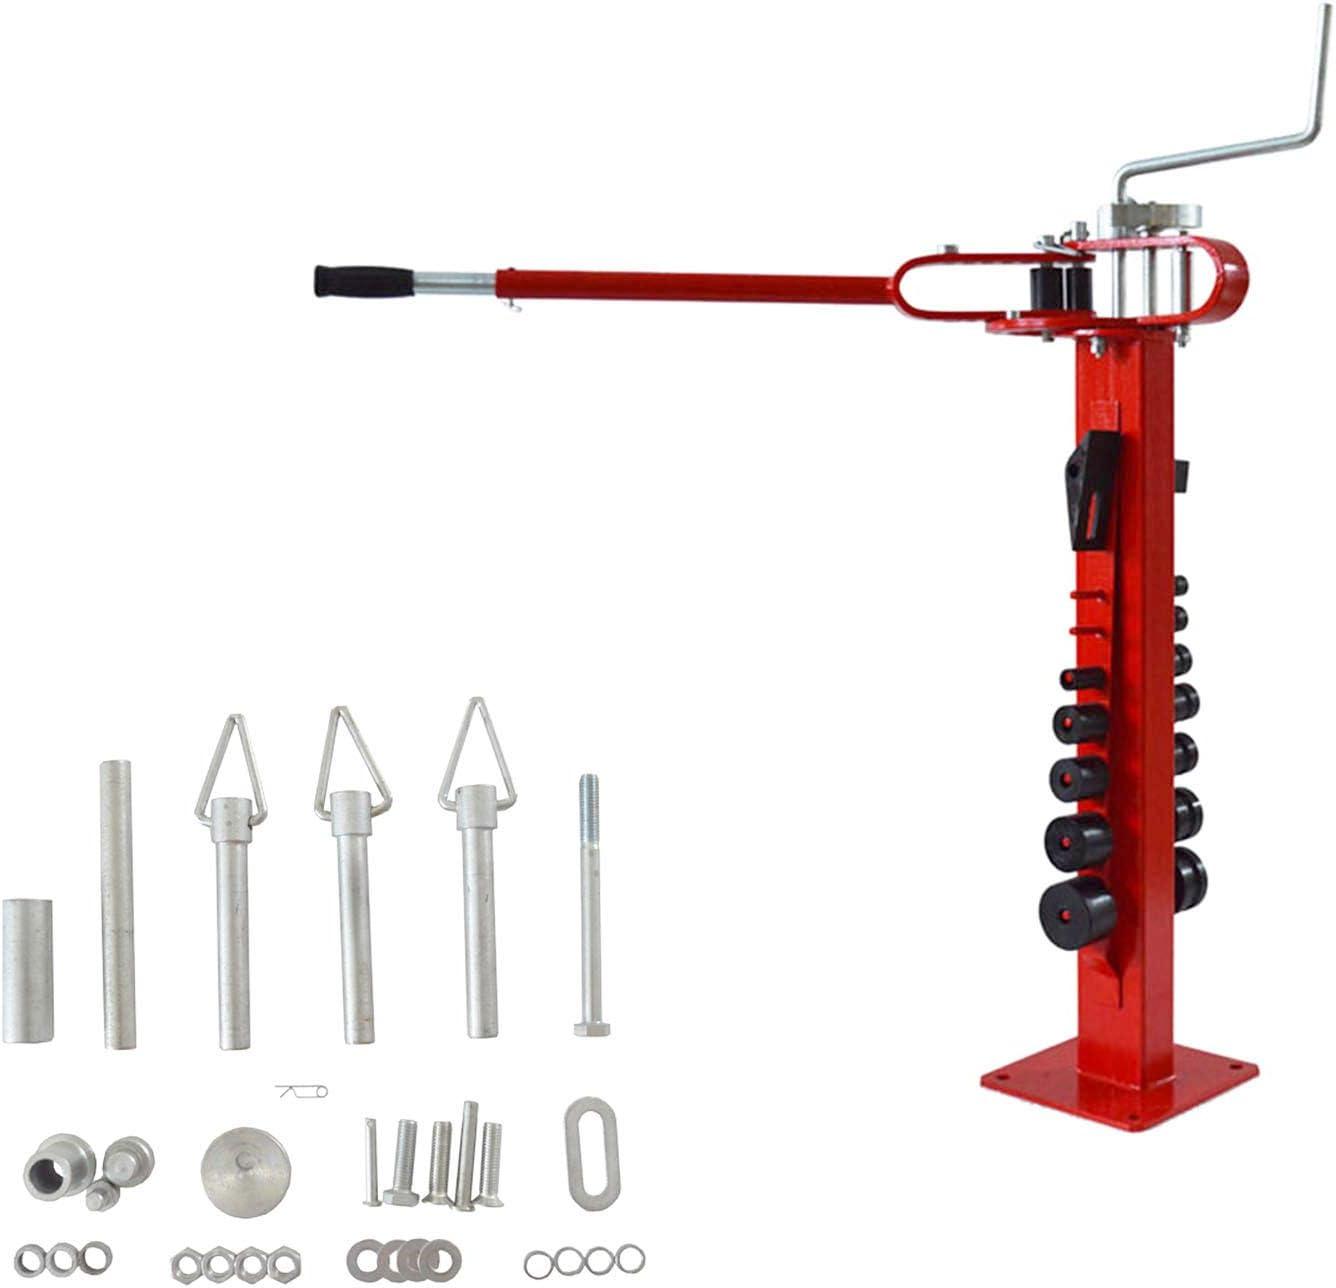 Power & Hand Tools Rebar Cutters & Benders eledenimport.com Floor ...